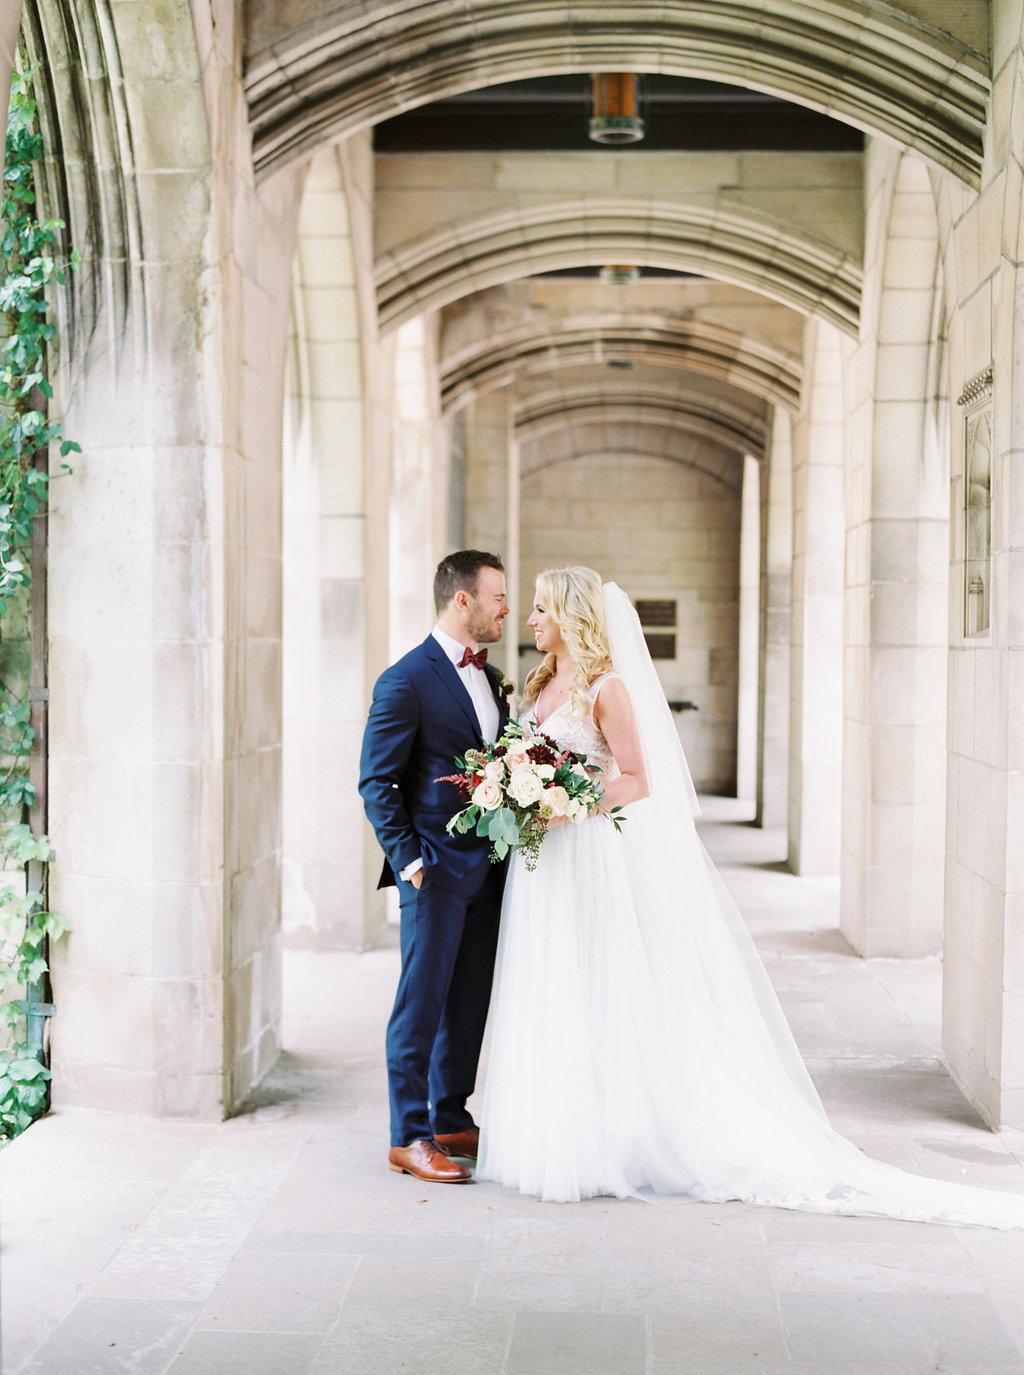 nicoleclarey_stacey+alexwedding_bride+groom-43.jpg